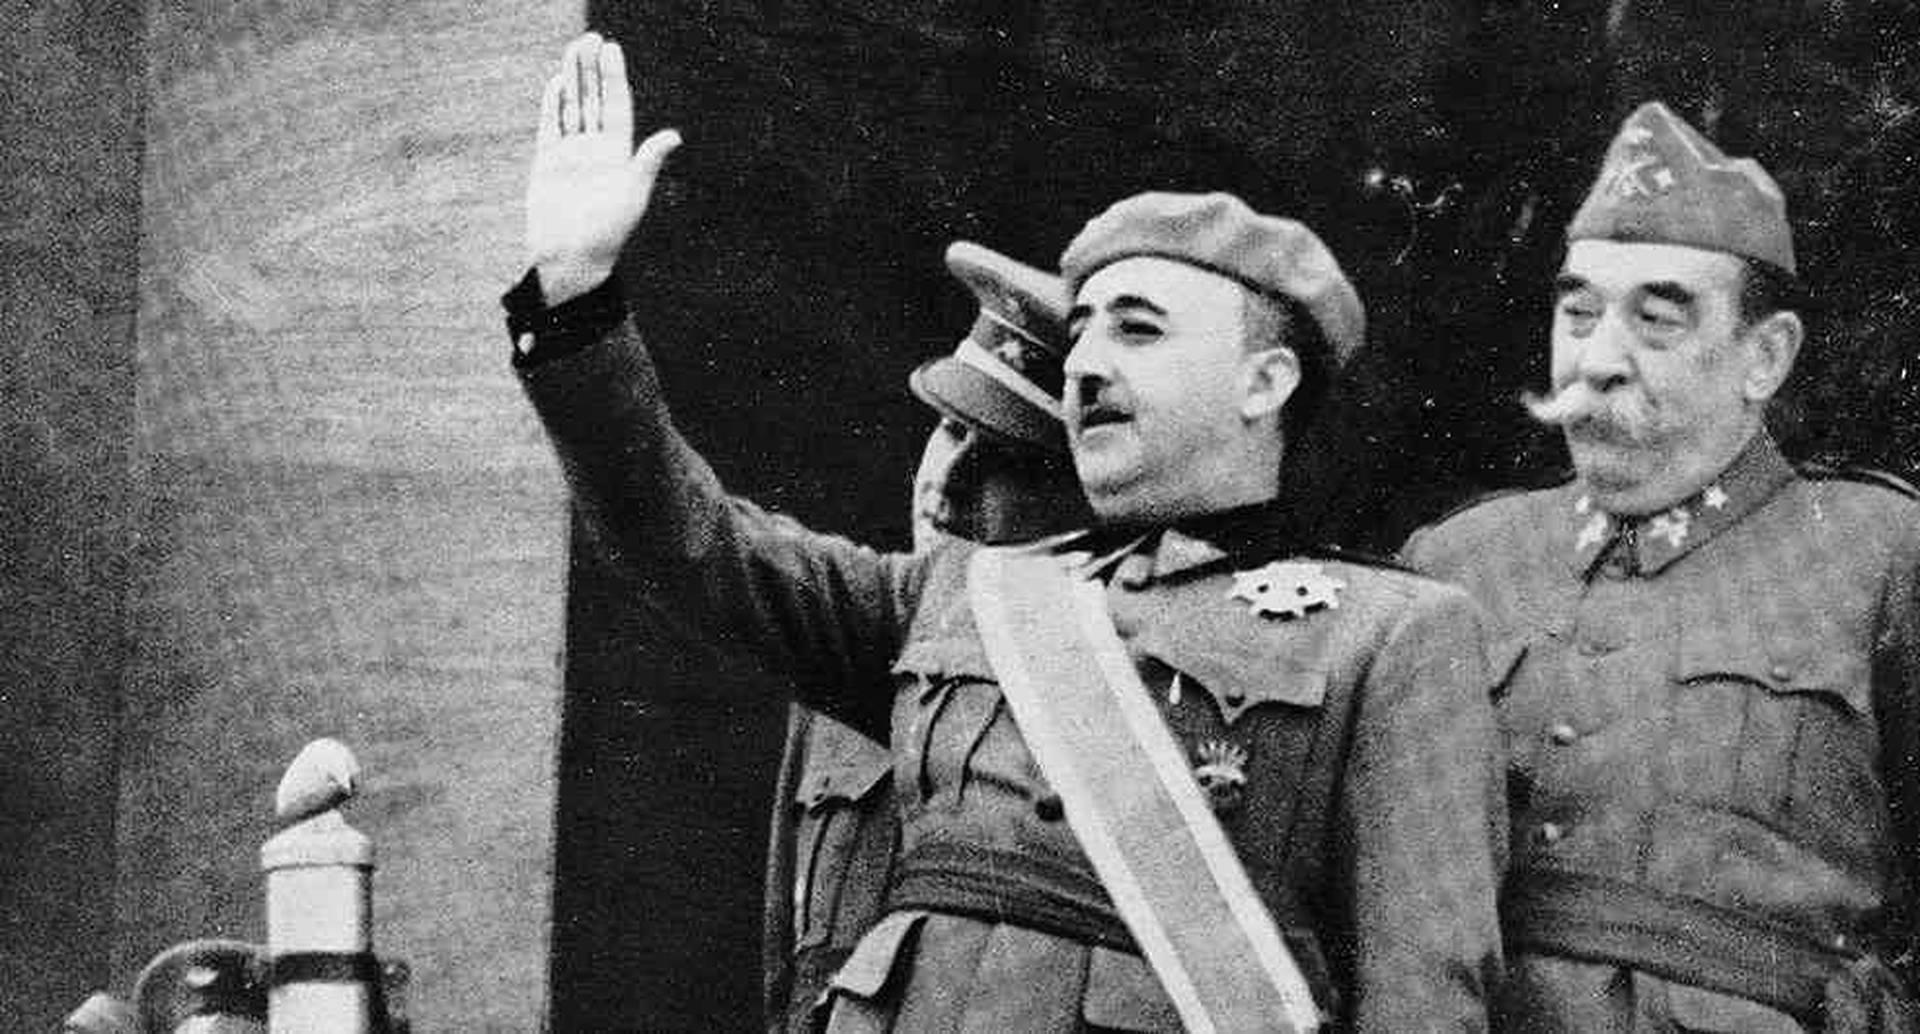 El dictador Francisco Franco anuncia el fin de la guerra en 1939. Foto: getty images